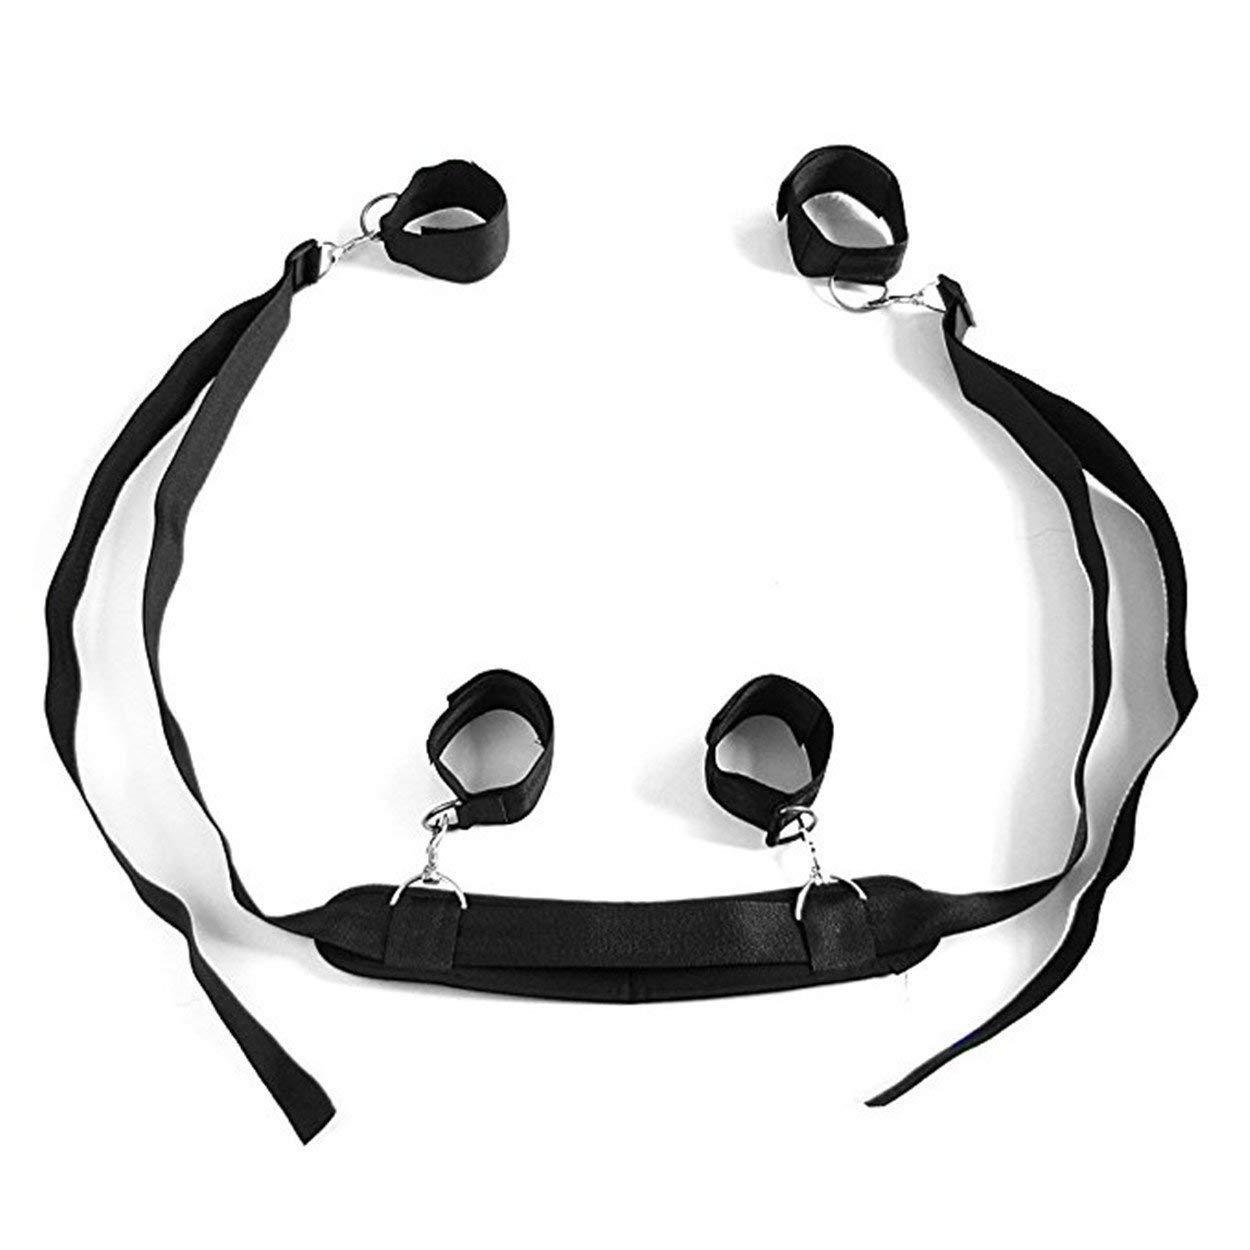 Qrlcas Negro Cosplay Adultos Hand & Tobillo Cuffs Strap Restricciones Kit Restricciones Strap de Cama Pareja Flirt Toy Juguete Sexual 072196